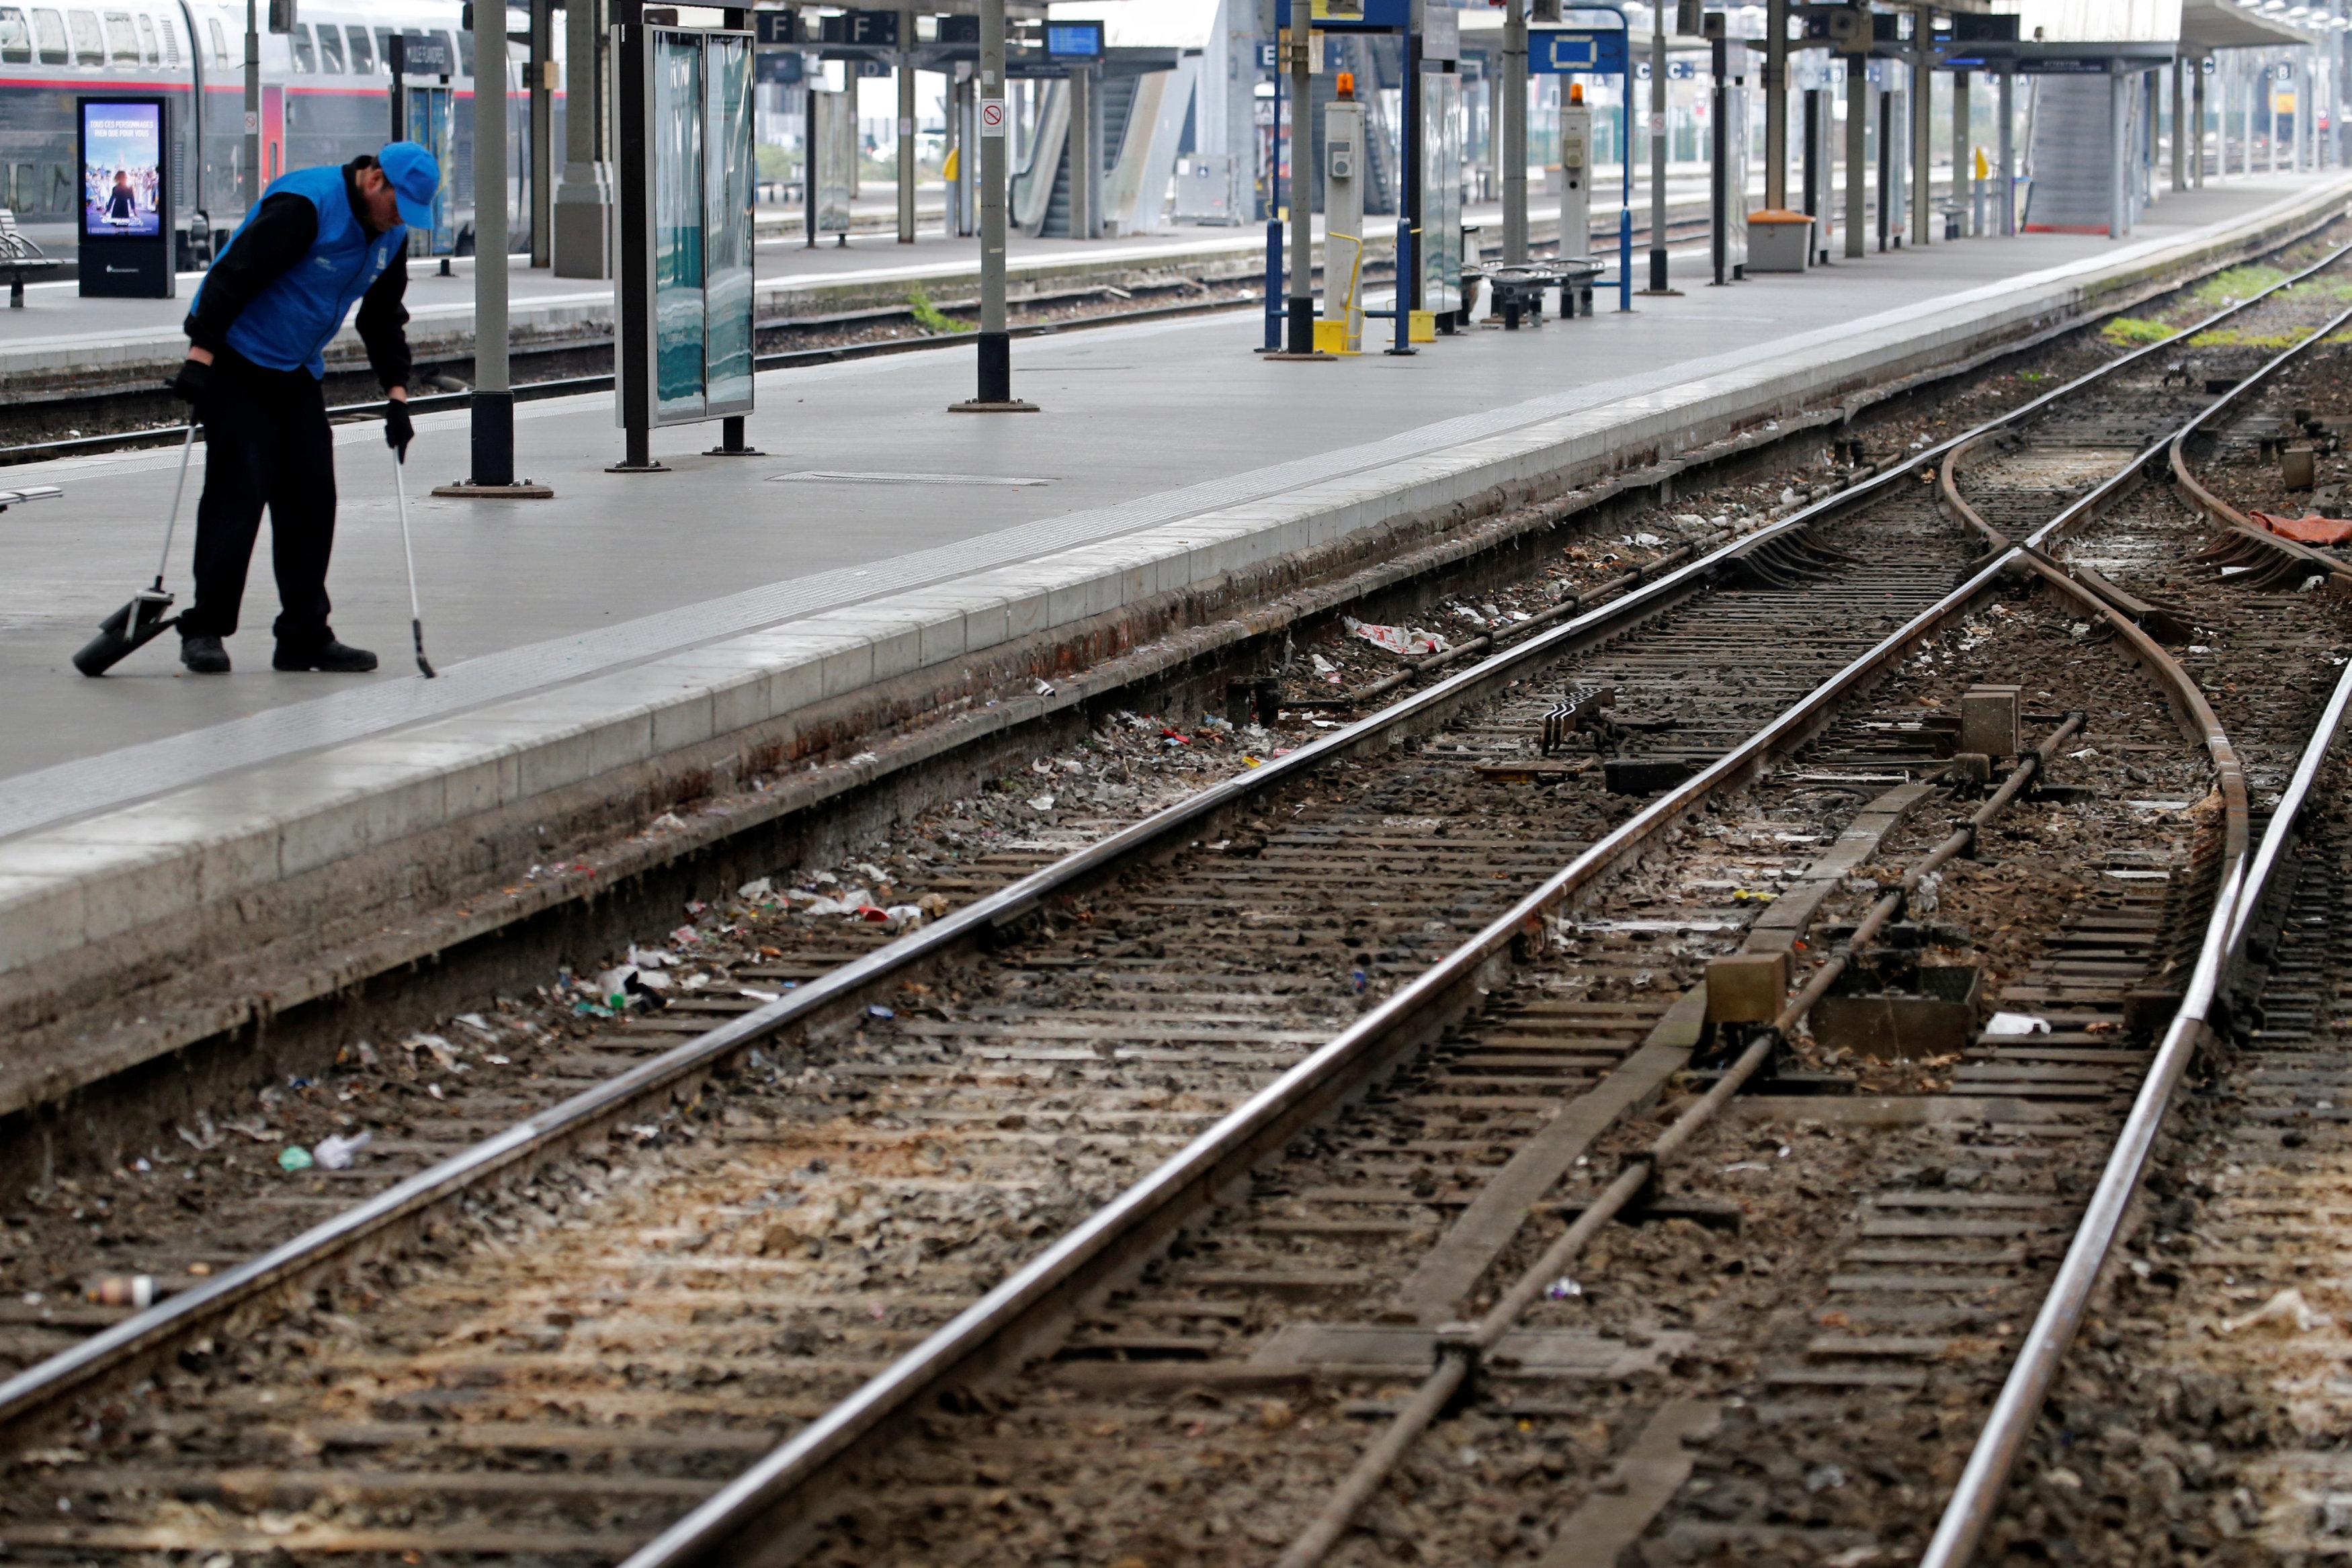 Macron's rail reforms and French union strikes